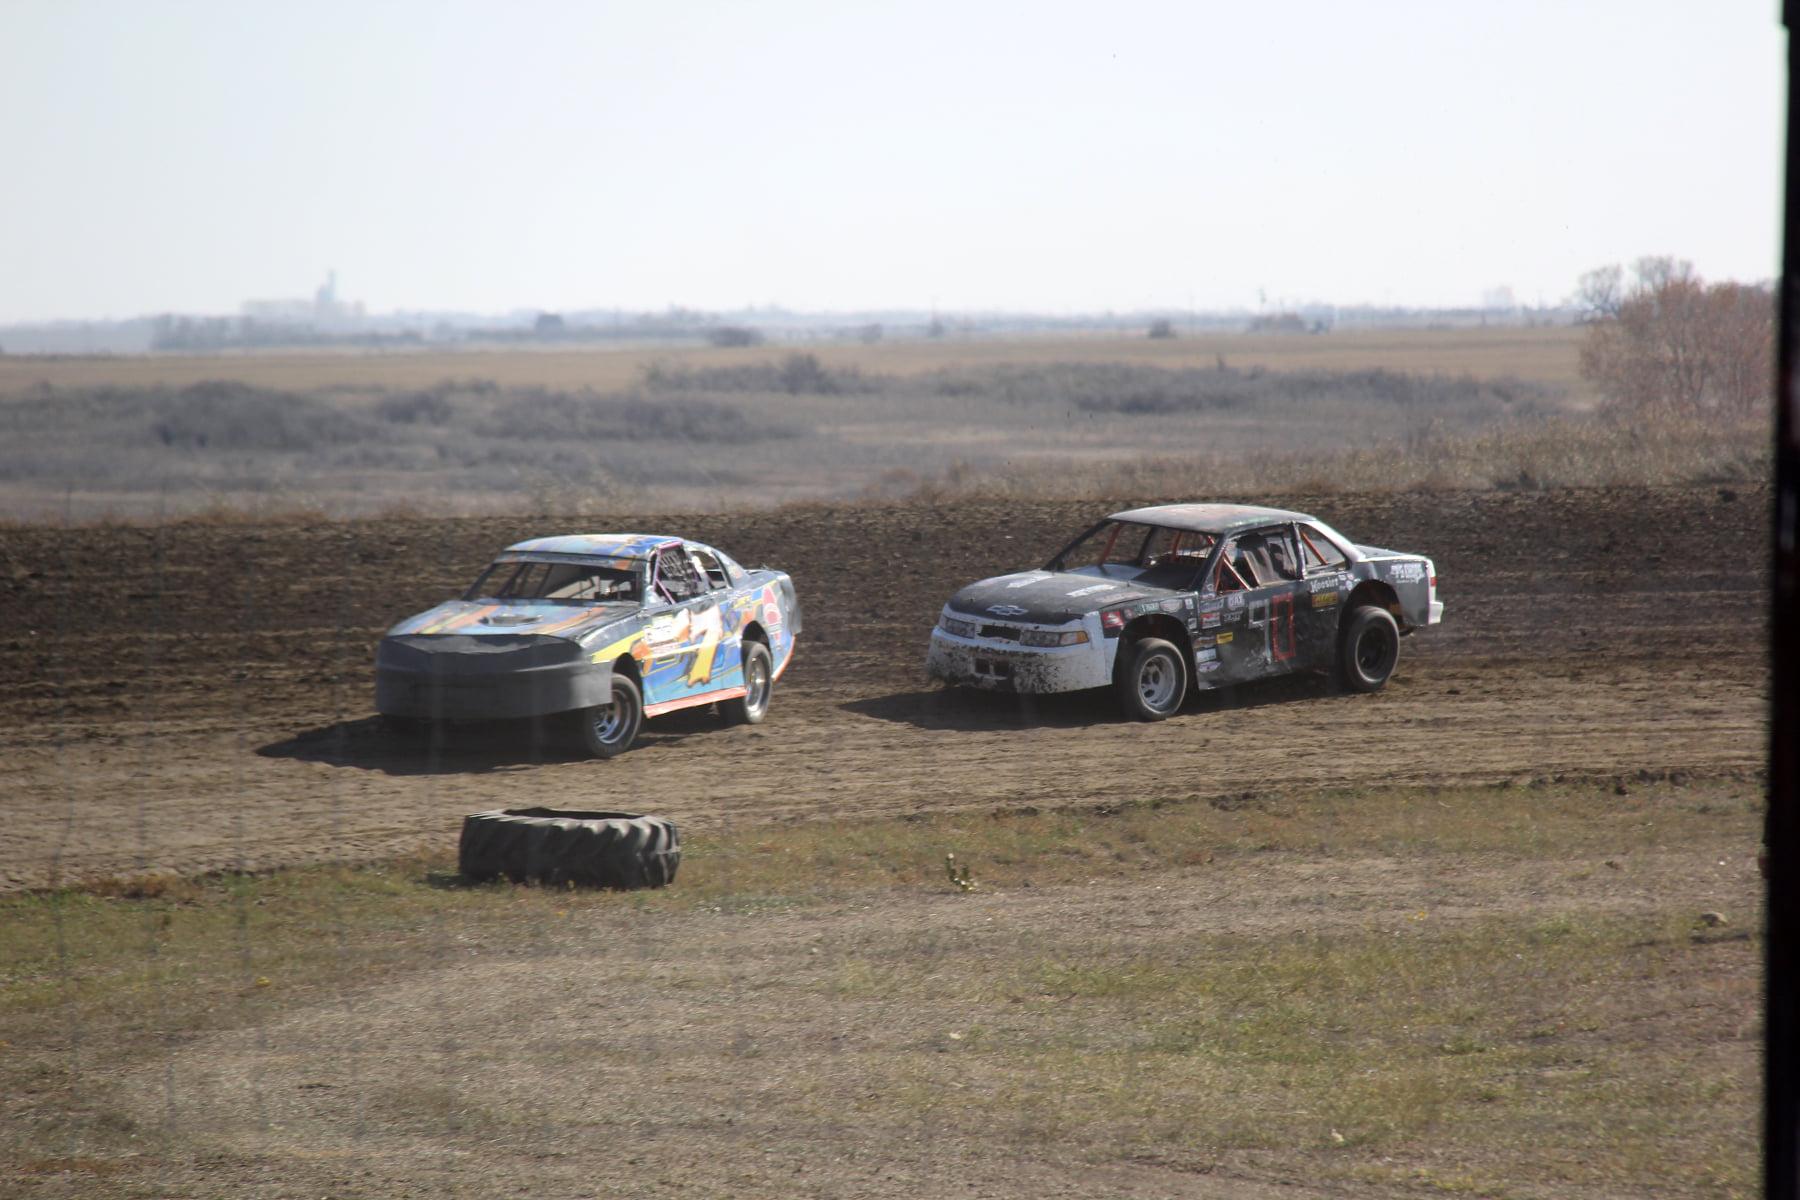 Outlook_Racing_Kemmer_Racing_Photography_8.jpg